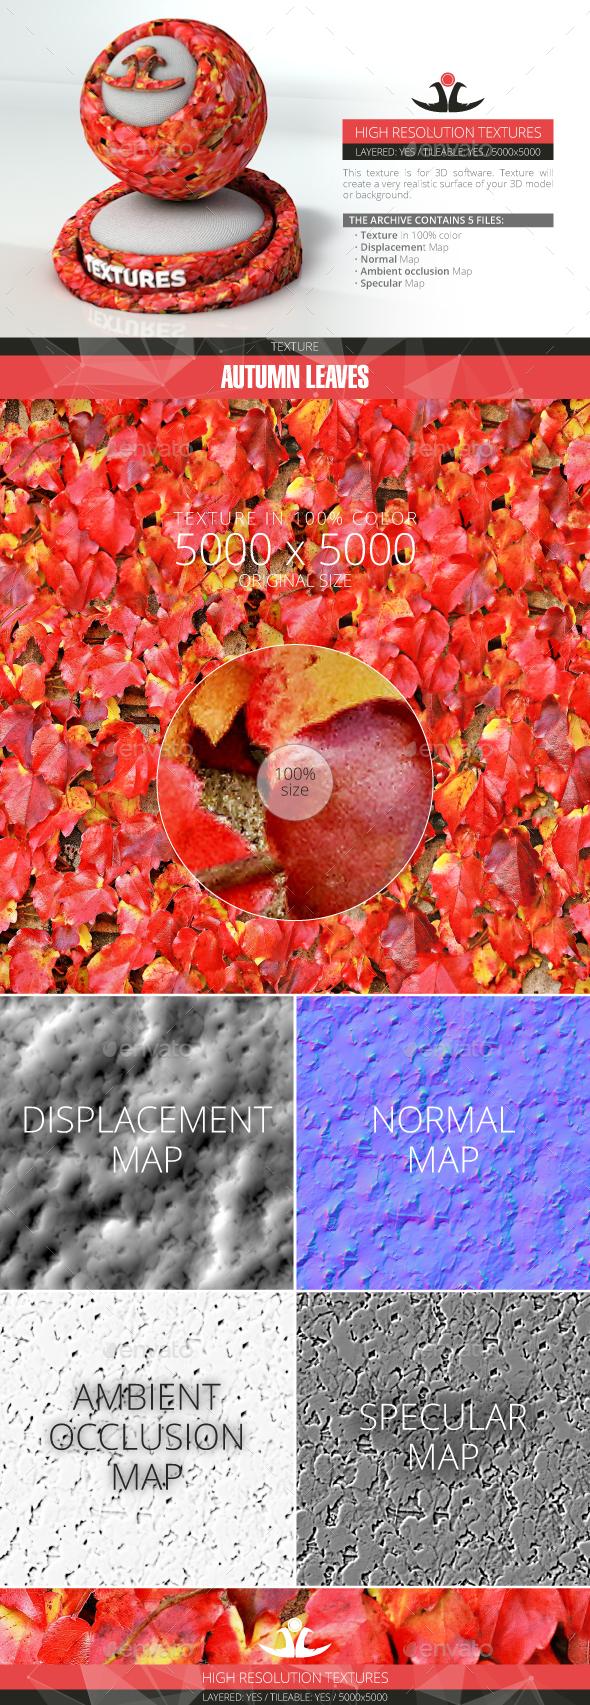 Autumn Leaves 16 - 3DOcean Item for Sale